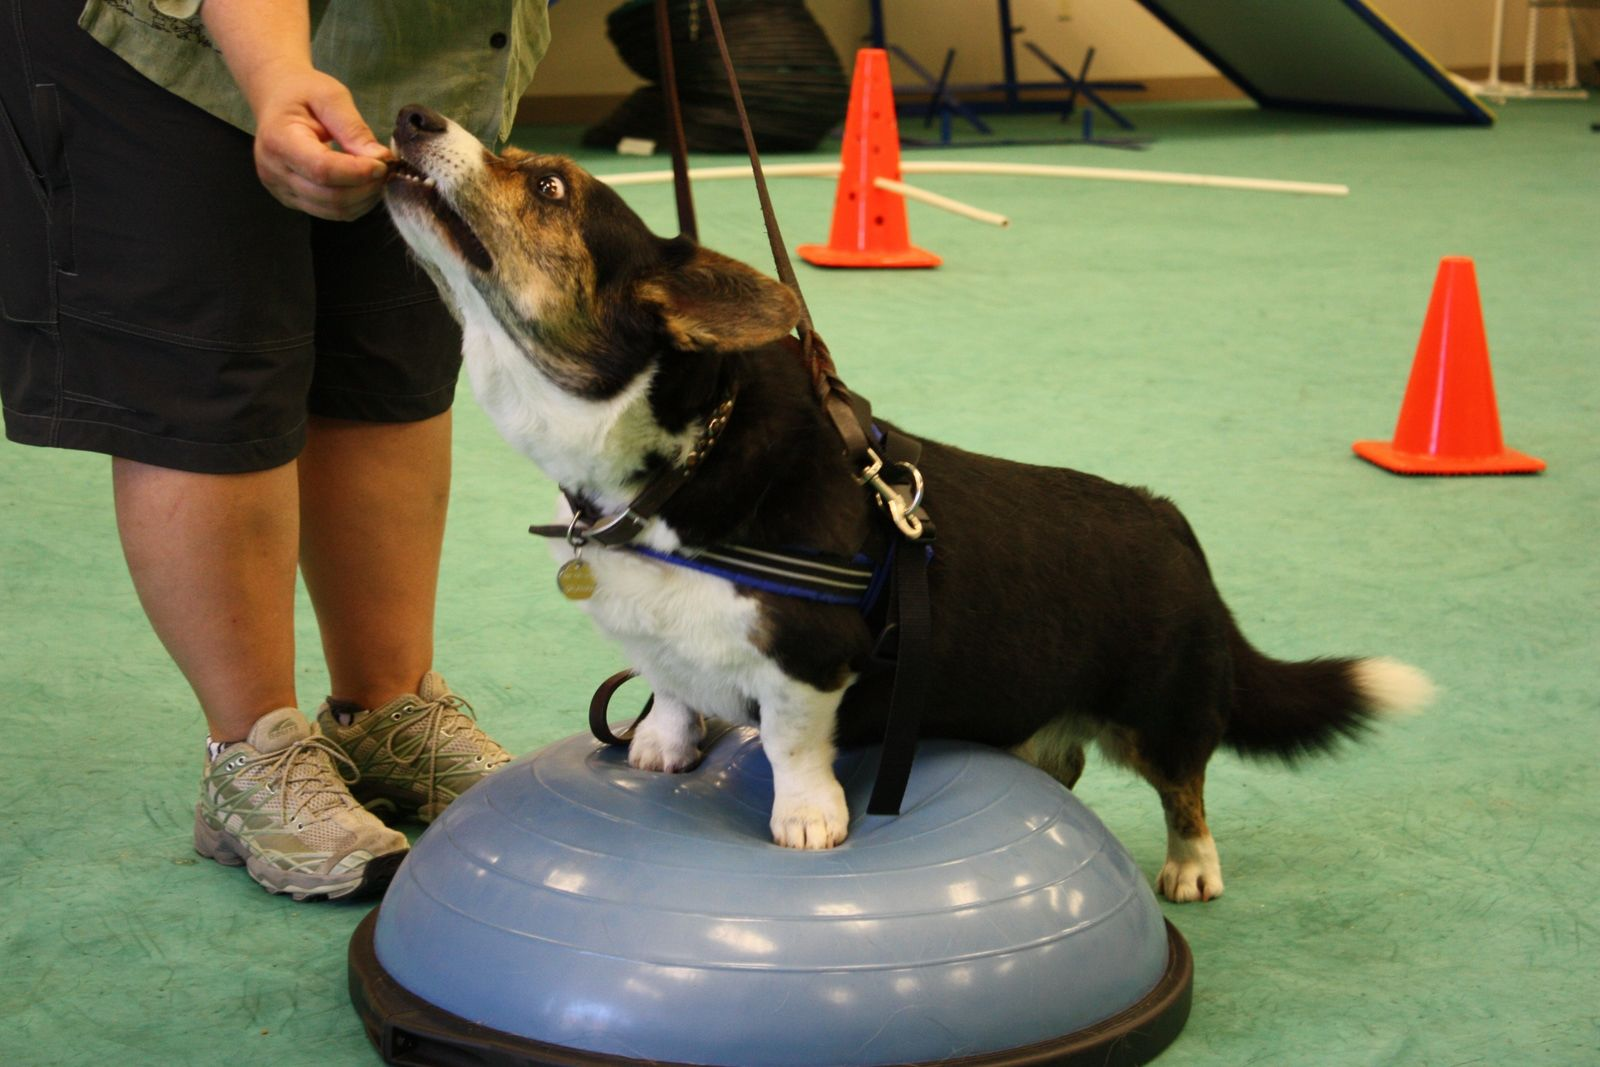 Bosu ball exercises Ball exercises, Bosu ball, Sports